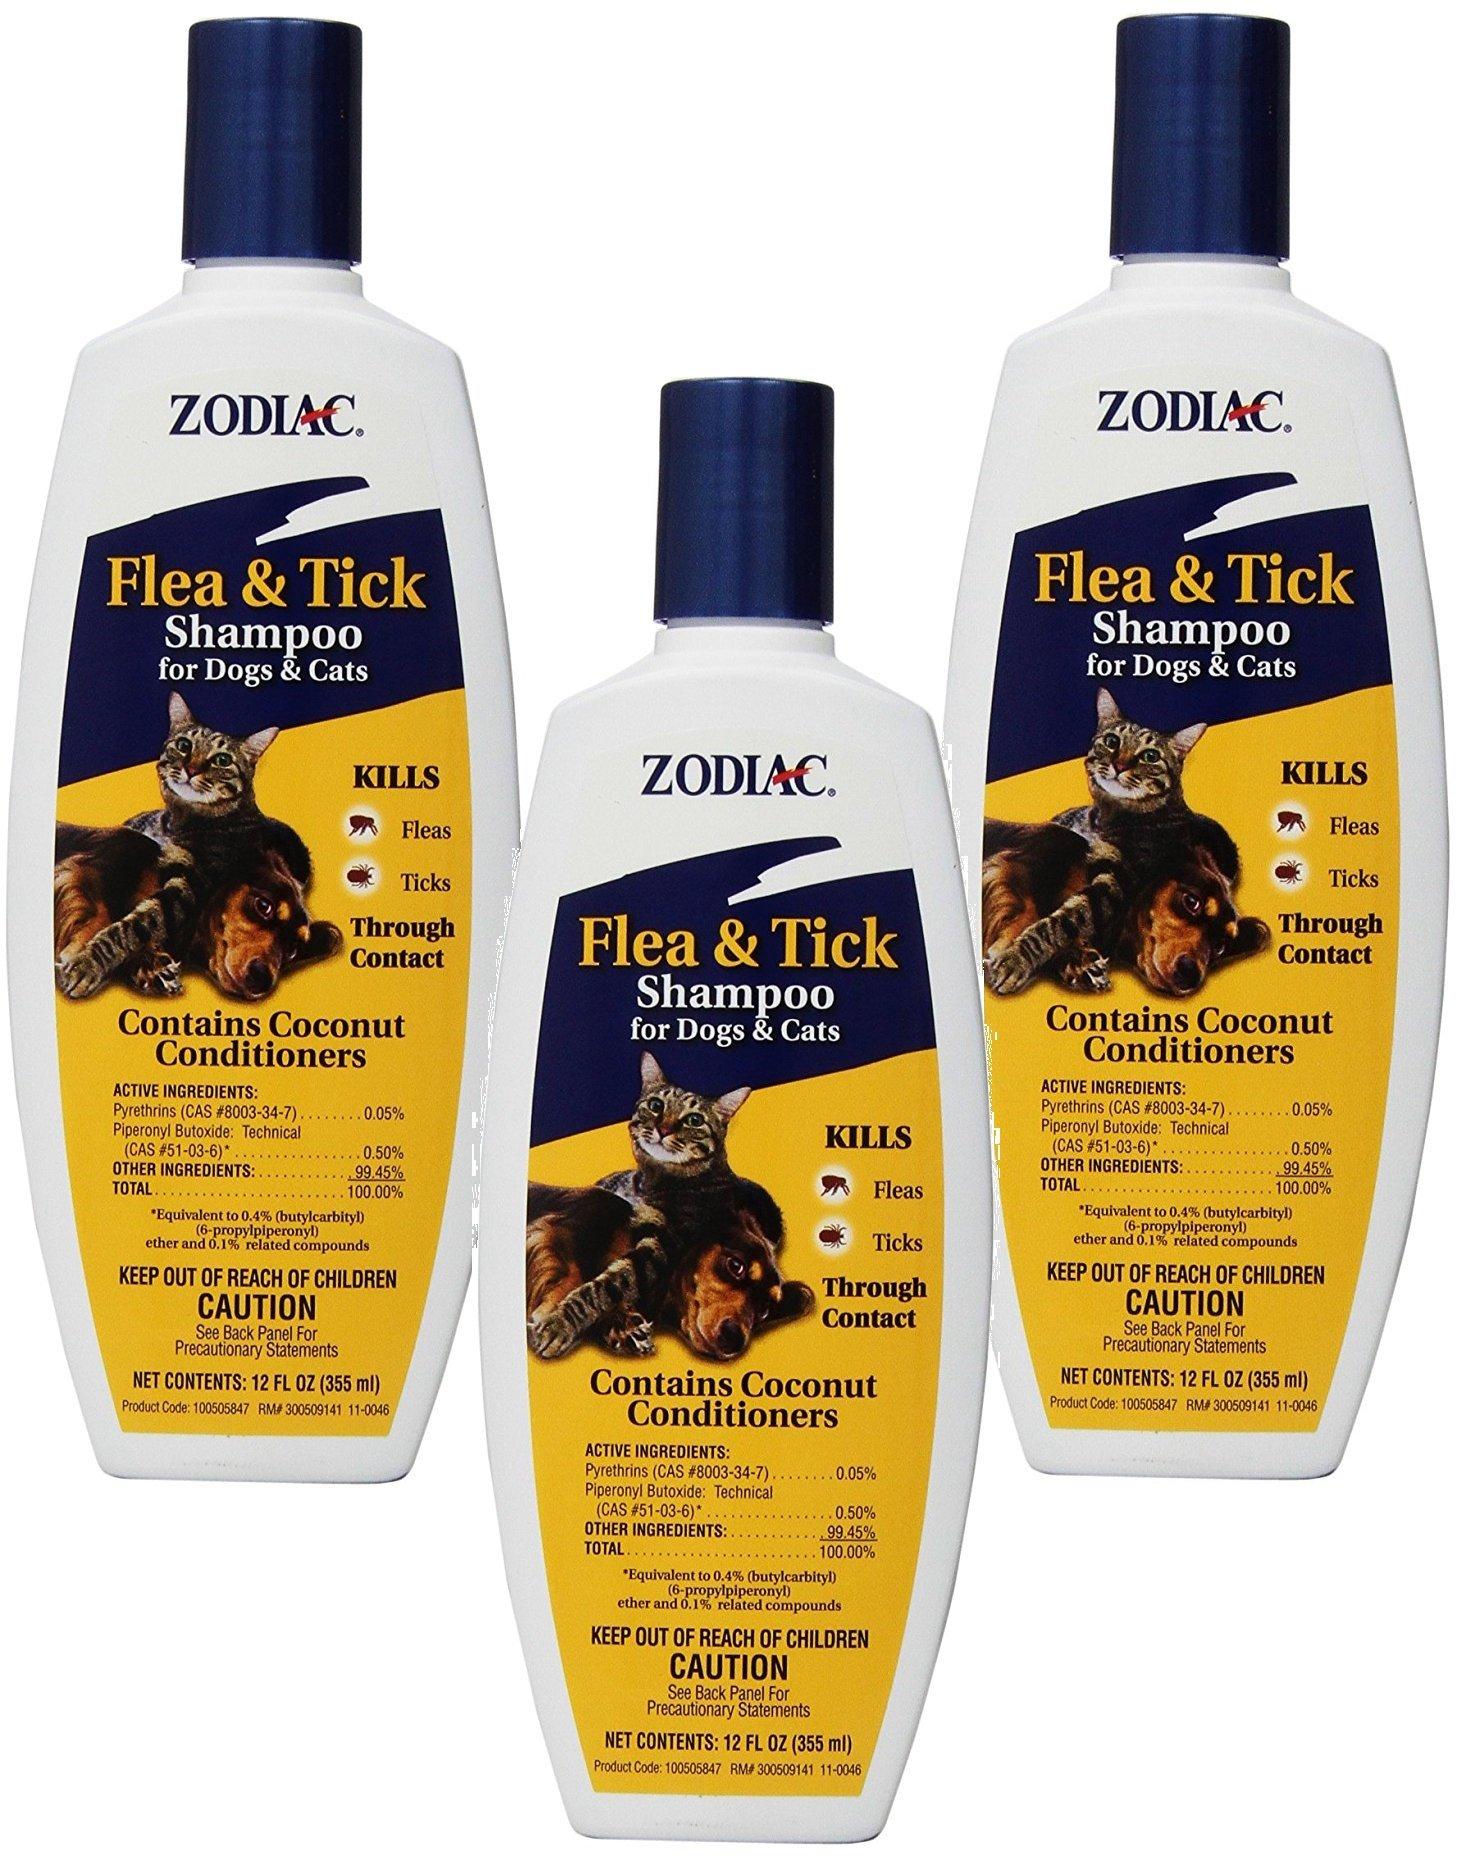 Zodiac (3 Pack) Flea & Tick Shampoo for Dogs & Cats, 12-Ounce